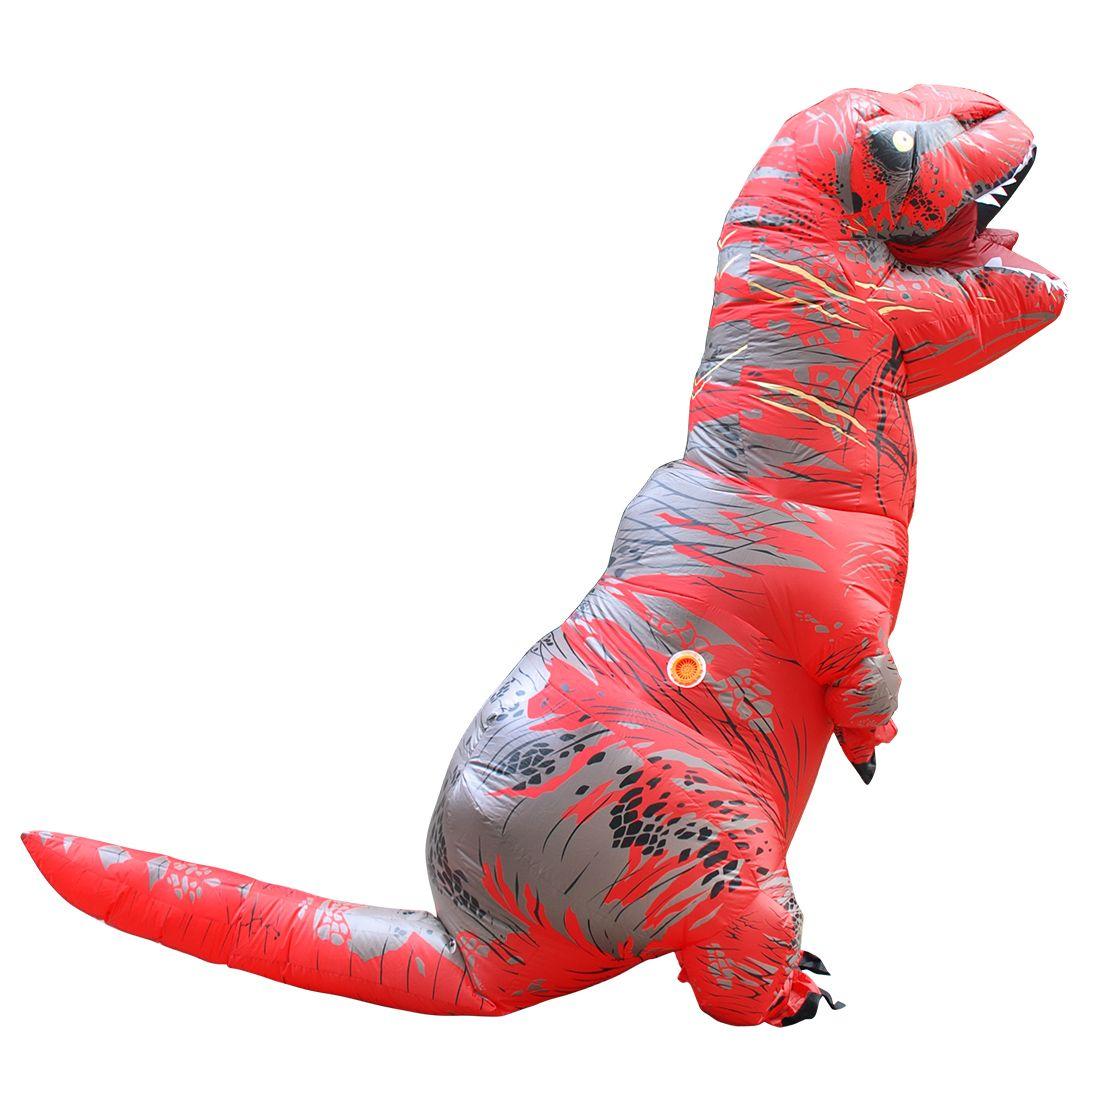 Disfraces Adultos Red T-REX Inflatable Dinosaur Costume Halloween ...